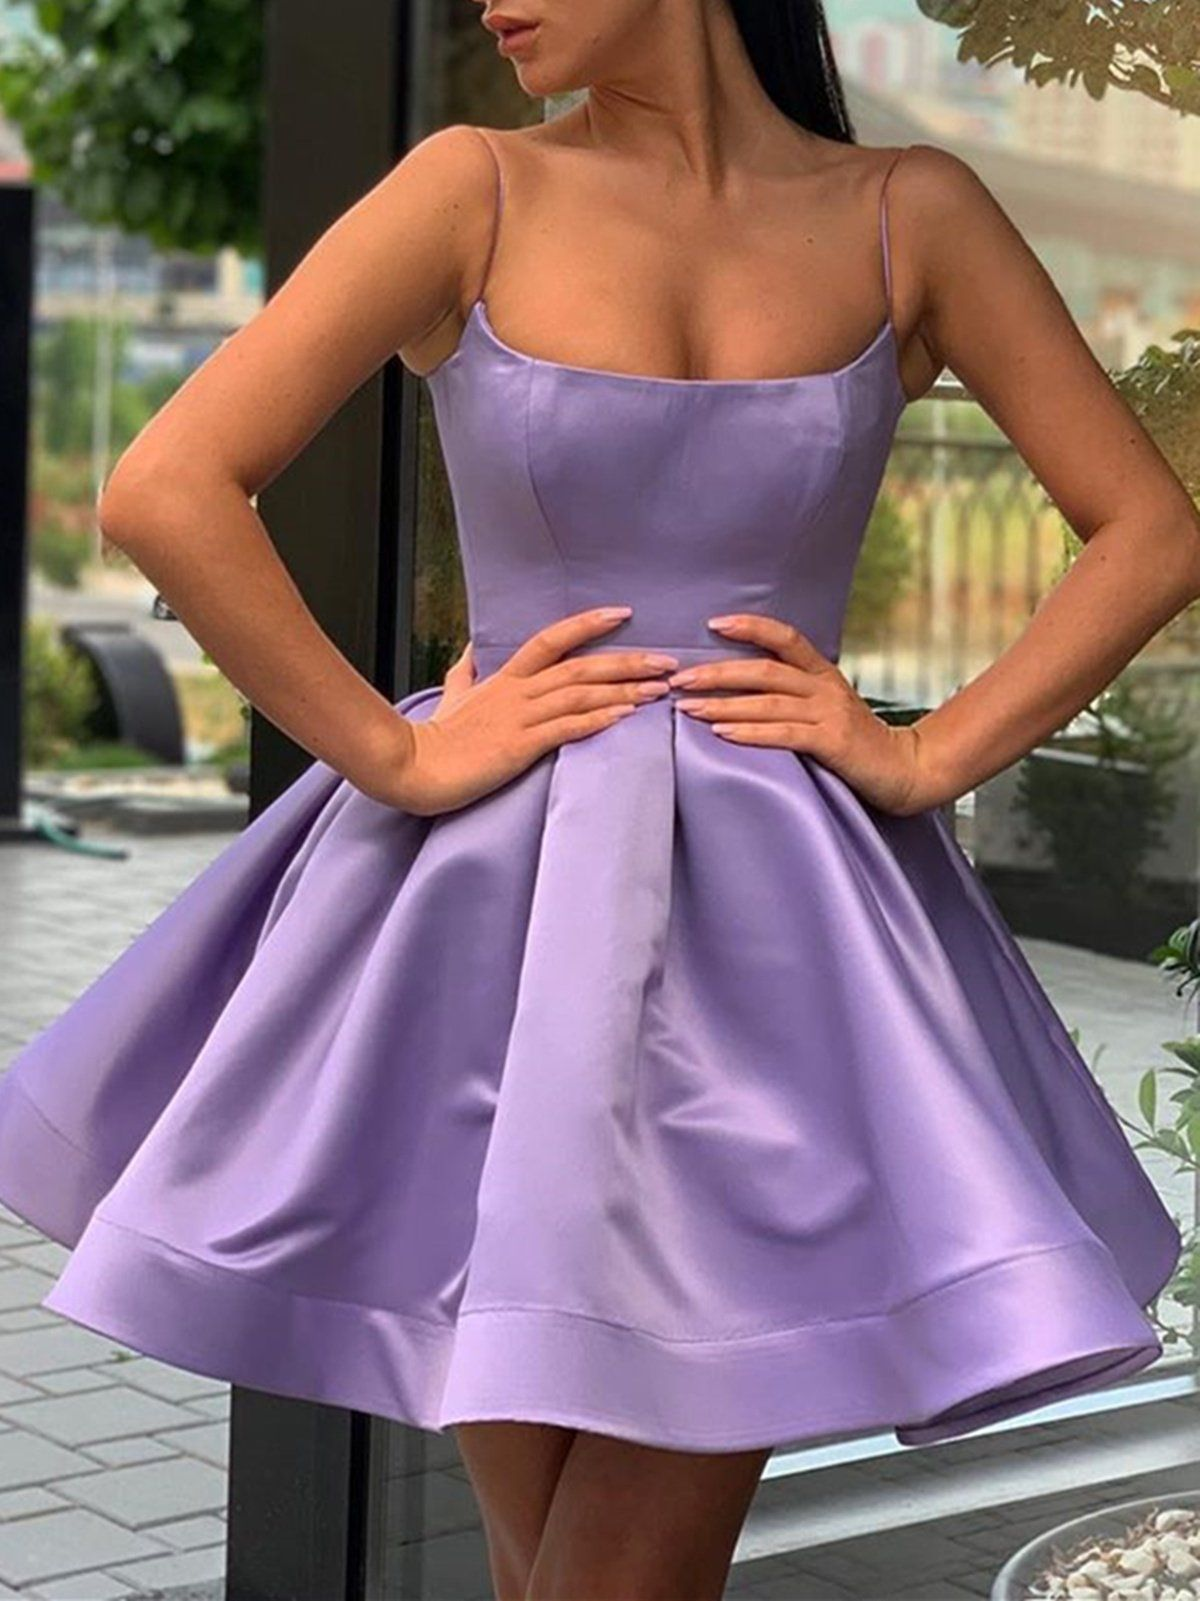 A Line Spaghetti Straps Short Purple Prom Dresses Short Purple Formal Homecoming Dresses In 2021 Purple Short Dress Purple Prom Dress Short Purple Prom Dress [ 1601 x 1200 Pixel ]